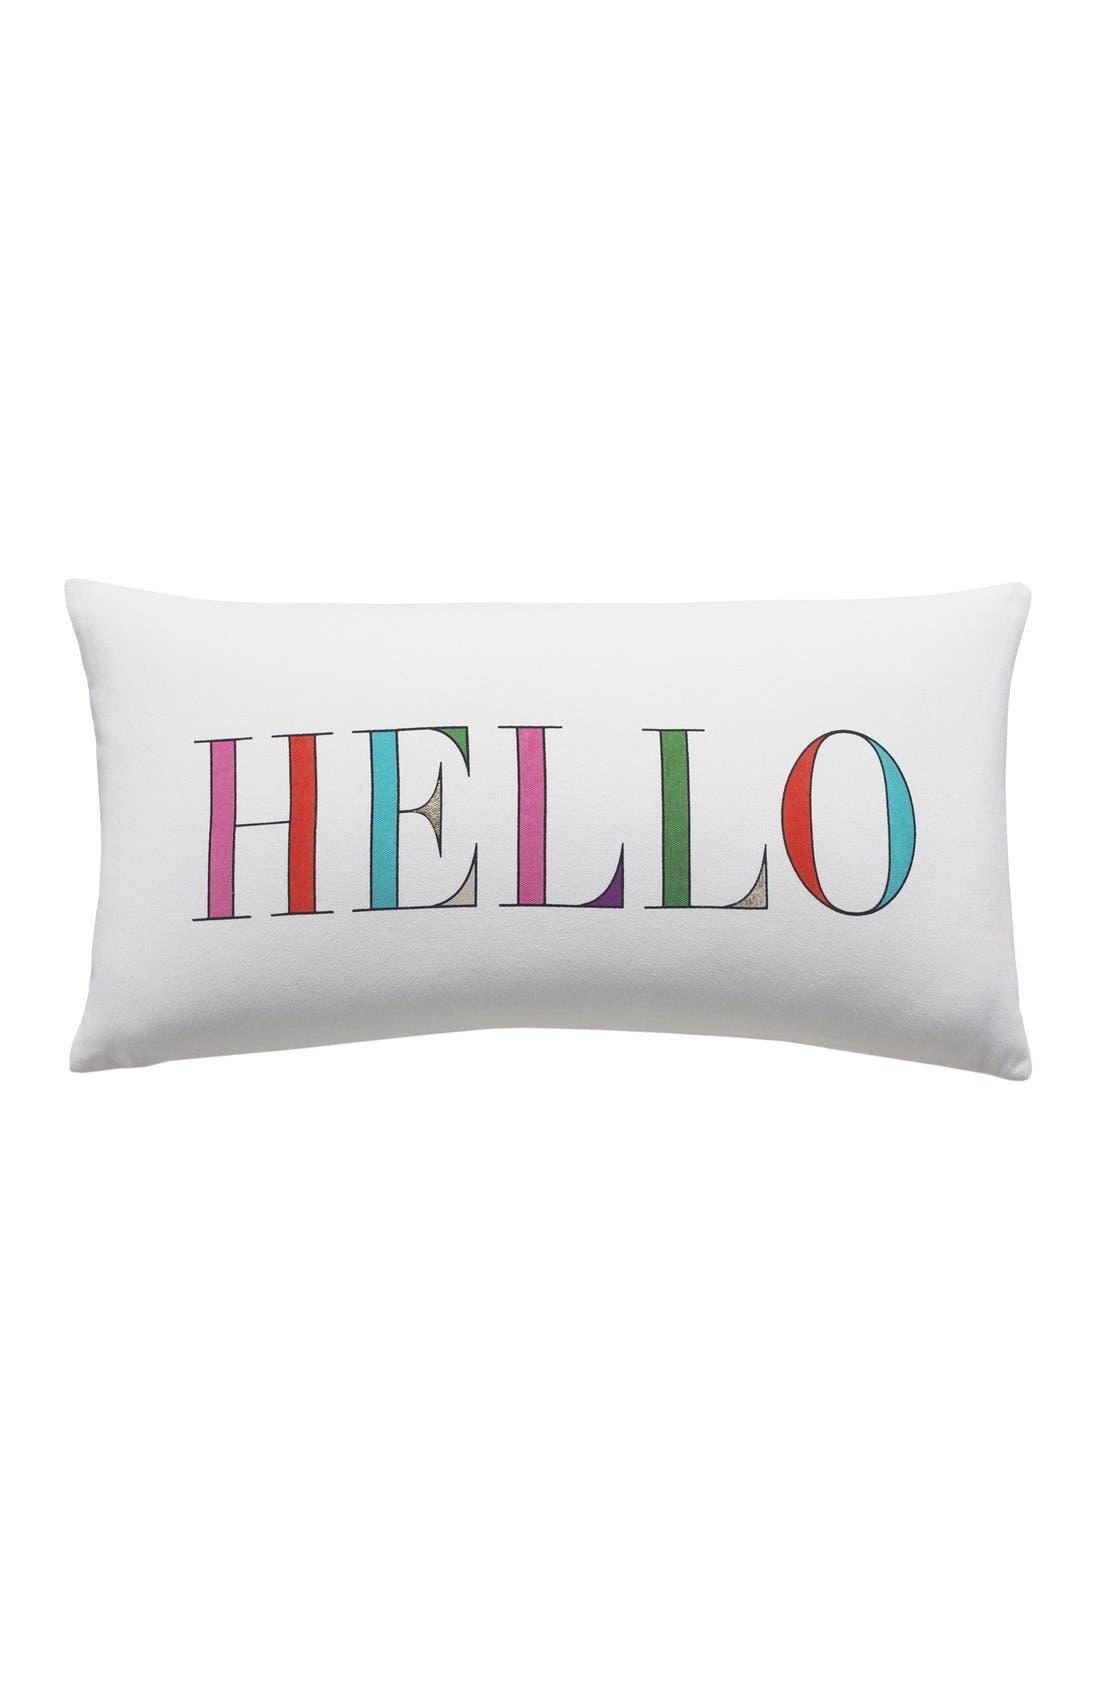 'hello' accent pillow,                             Main thumbnail 1, color,                             White/ Multi